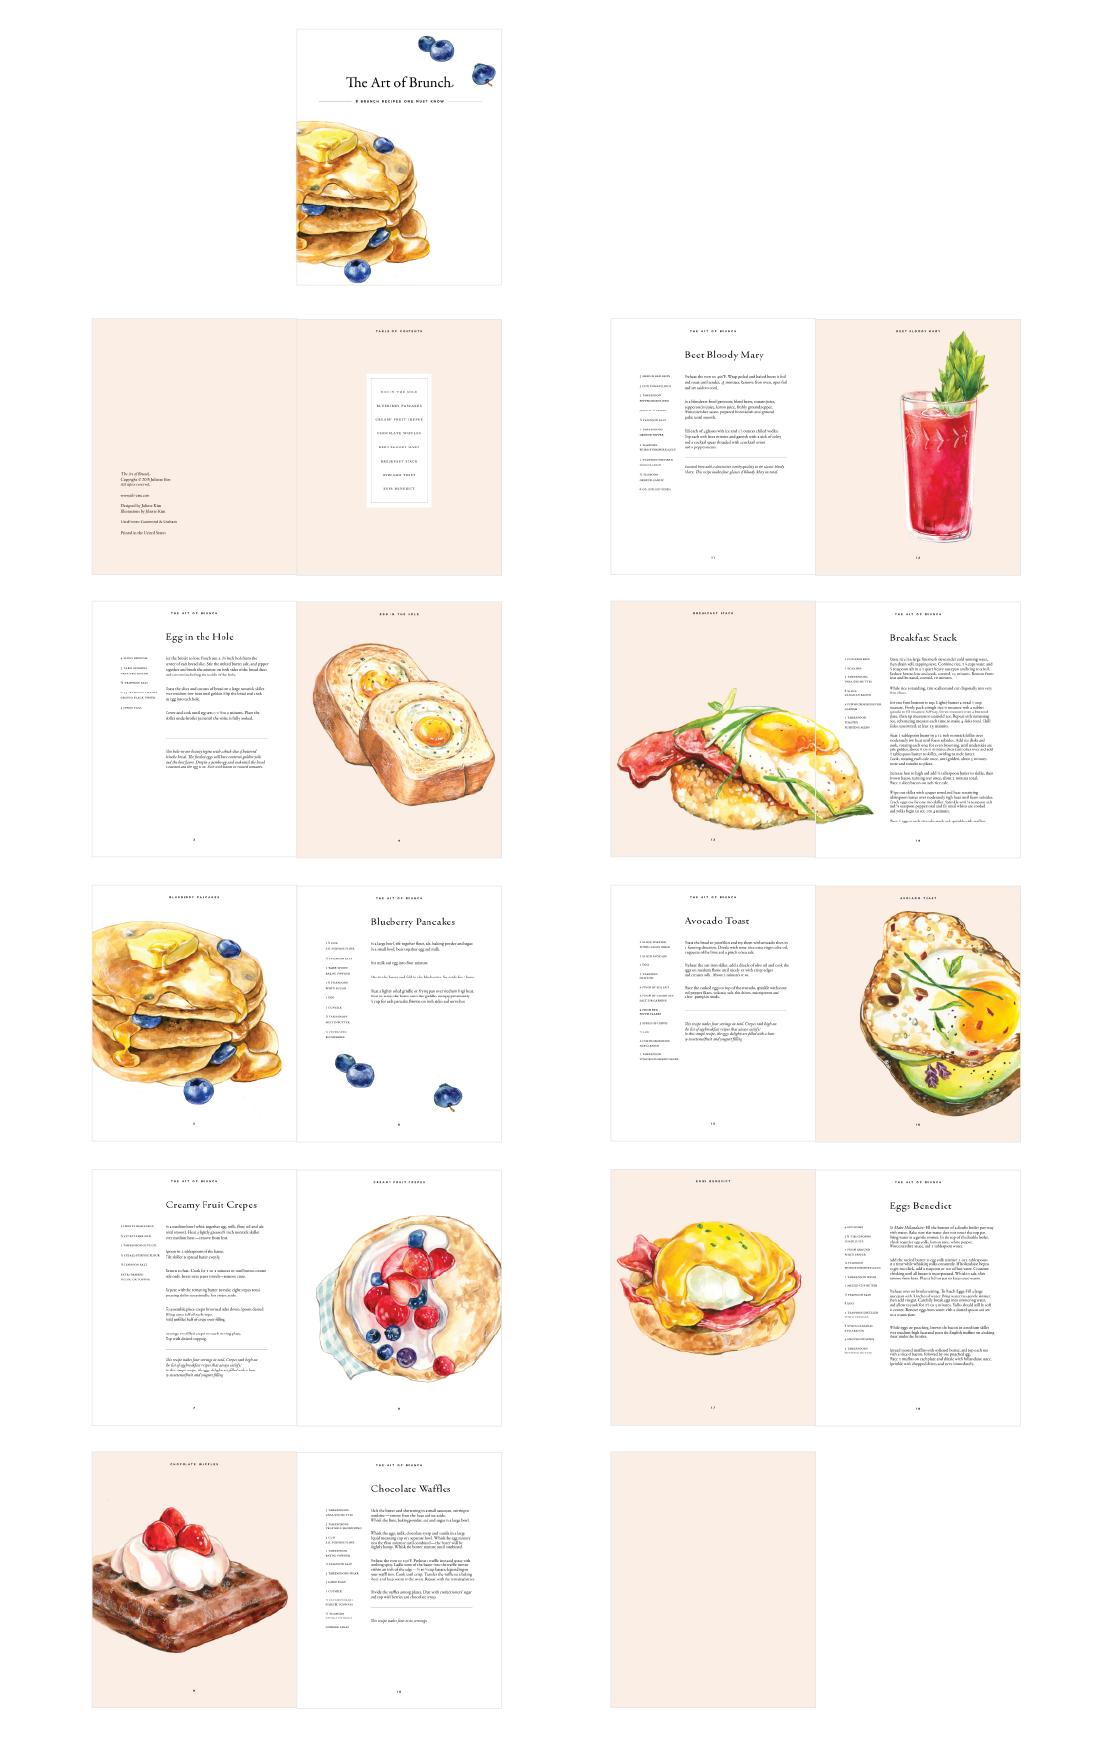 This Is A Cookbook Juliette Kim Designed And Illustrated For Typography 2 Class At Rhode Island School Of Design Recipe Book Design Menu Design Cookbook Design